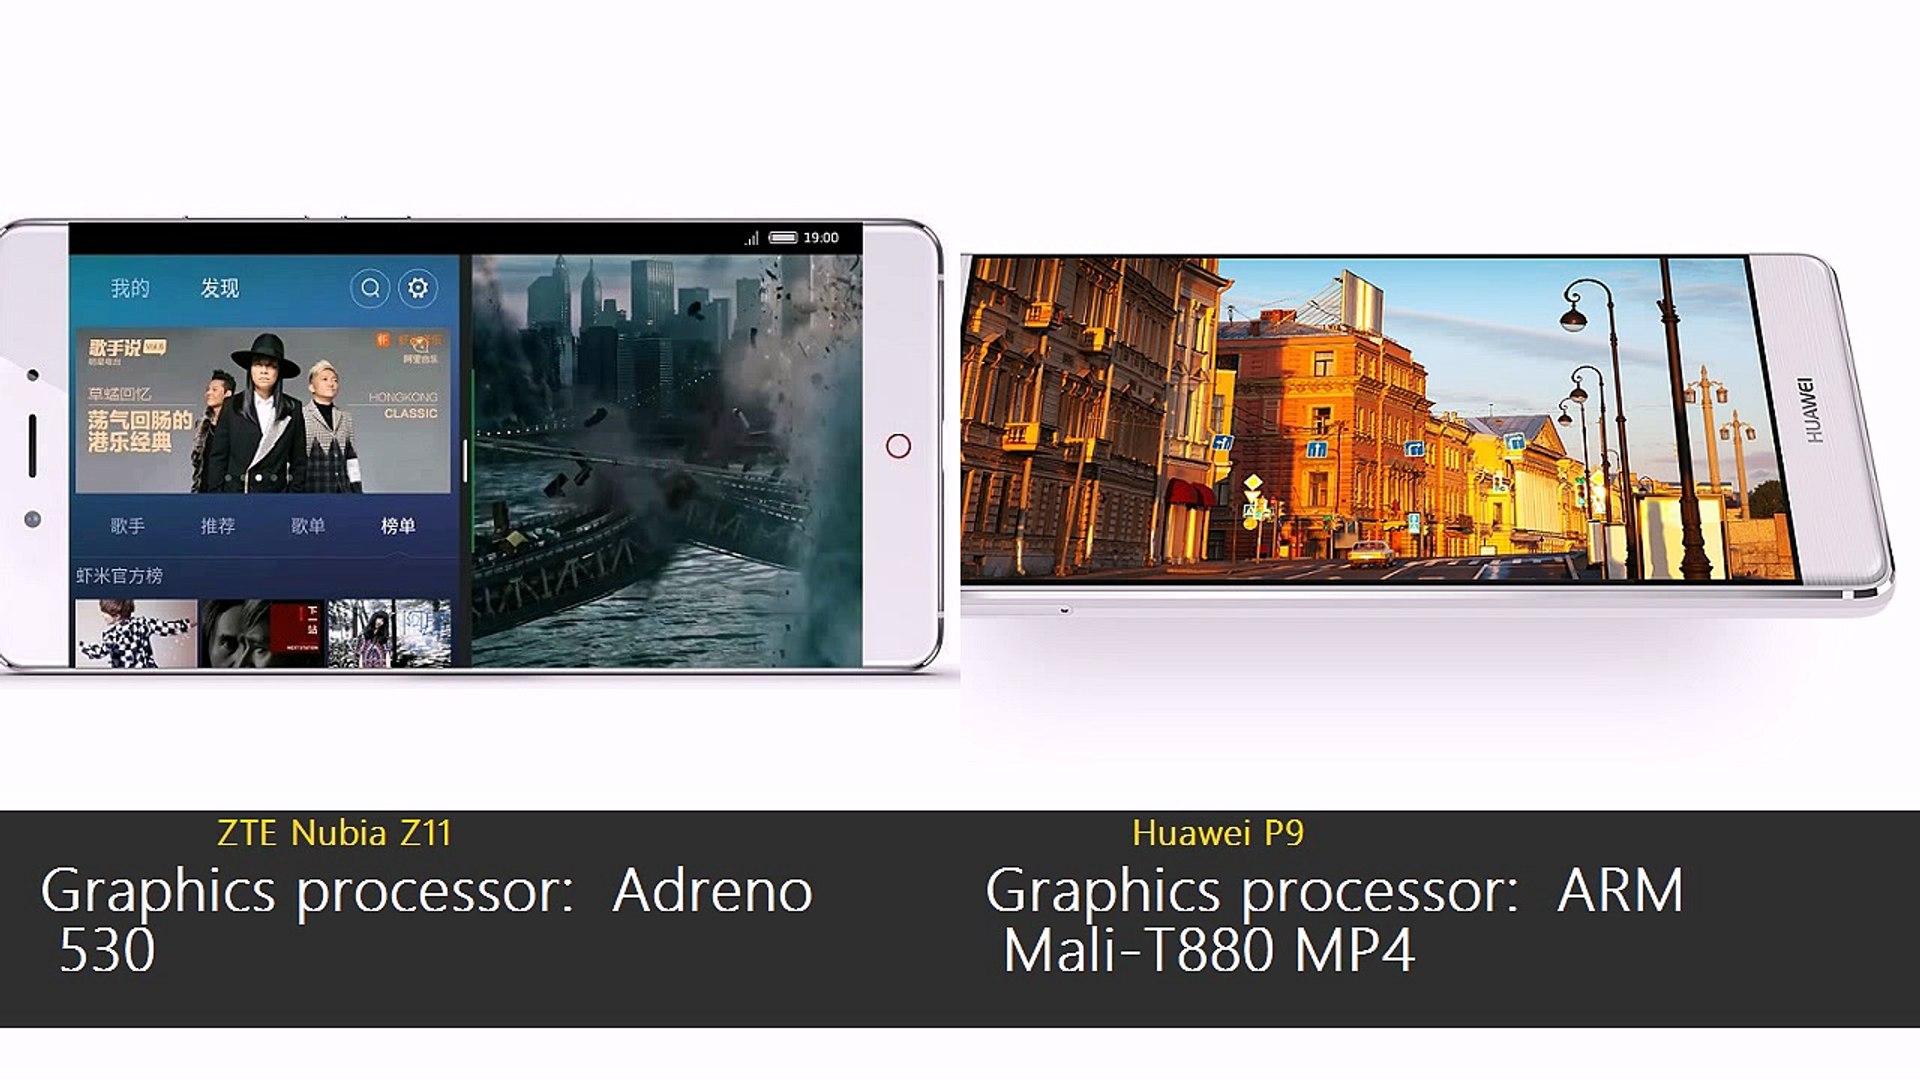 ZTE Nubia Z11 vs Huawei P9